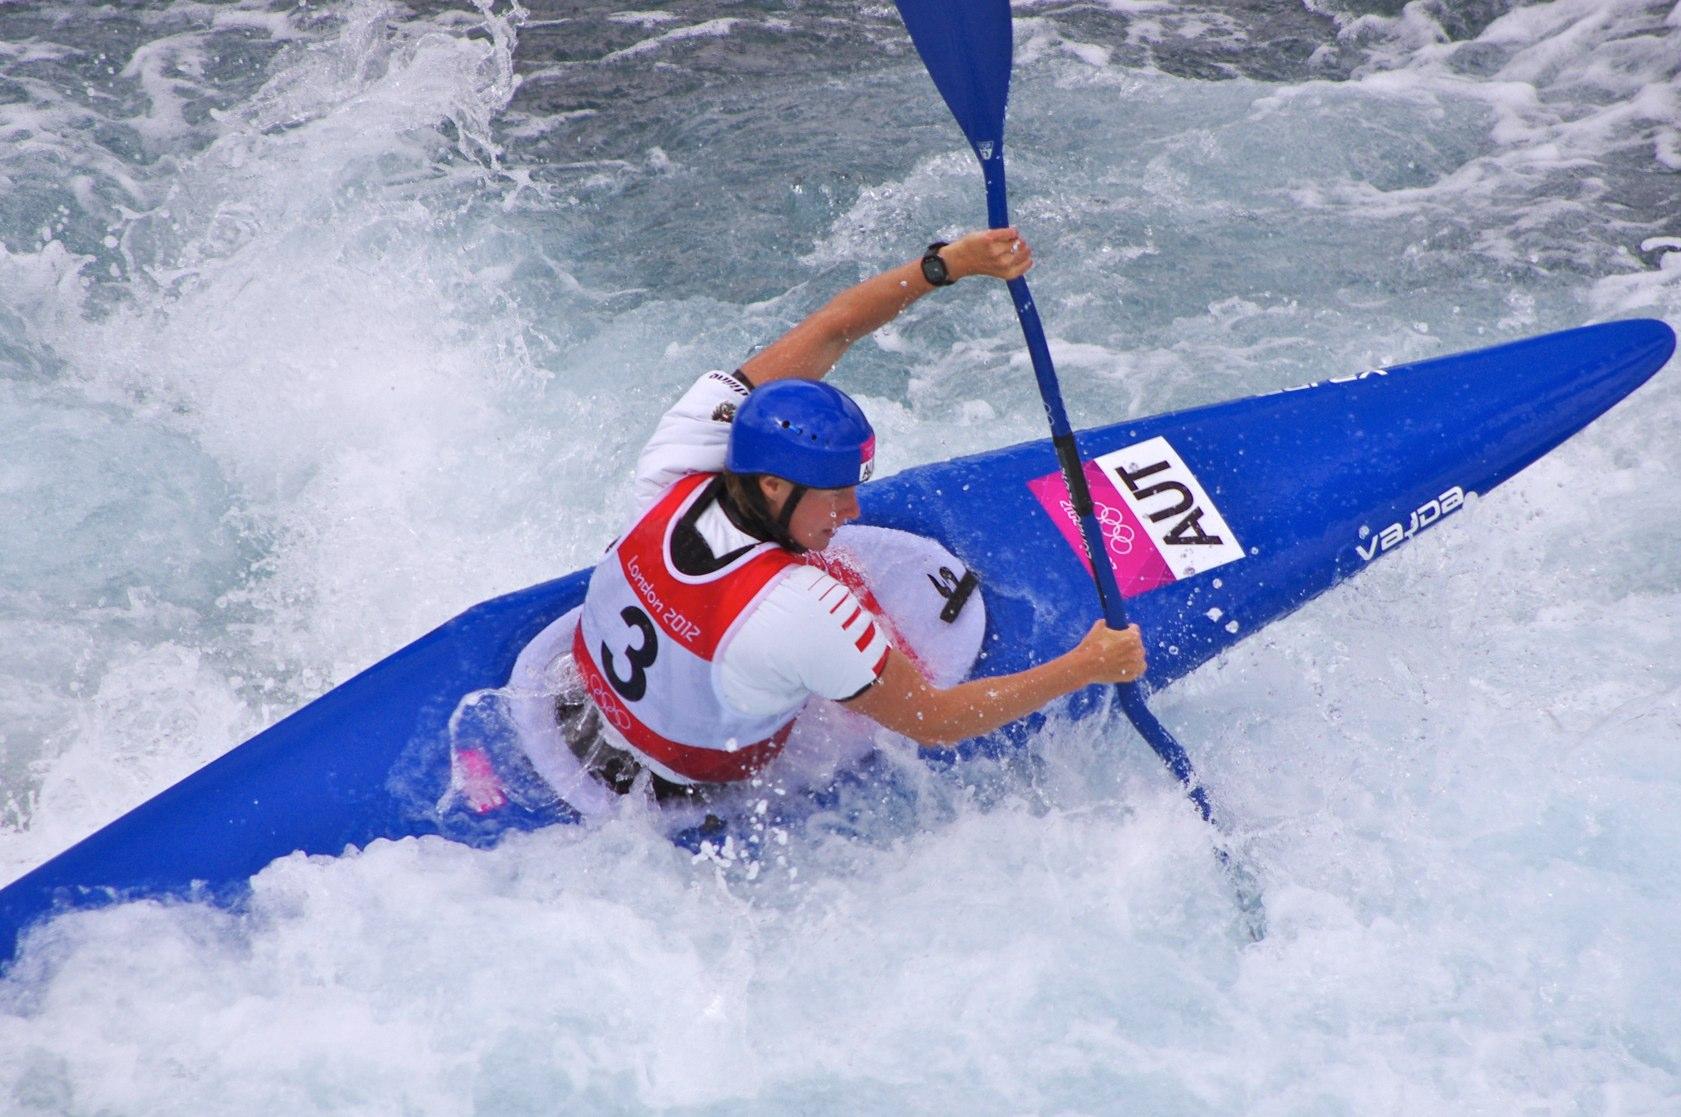 FileSlalom Canoeing 2012 Olympics W K1 AUT Corinna Kuhnle